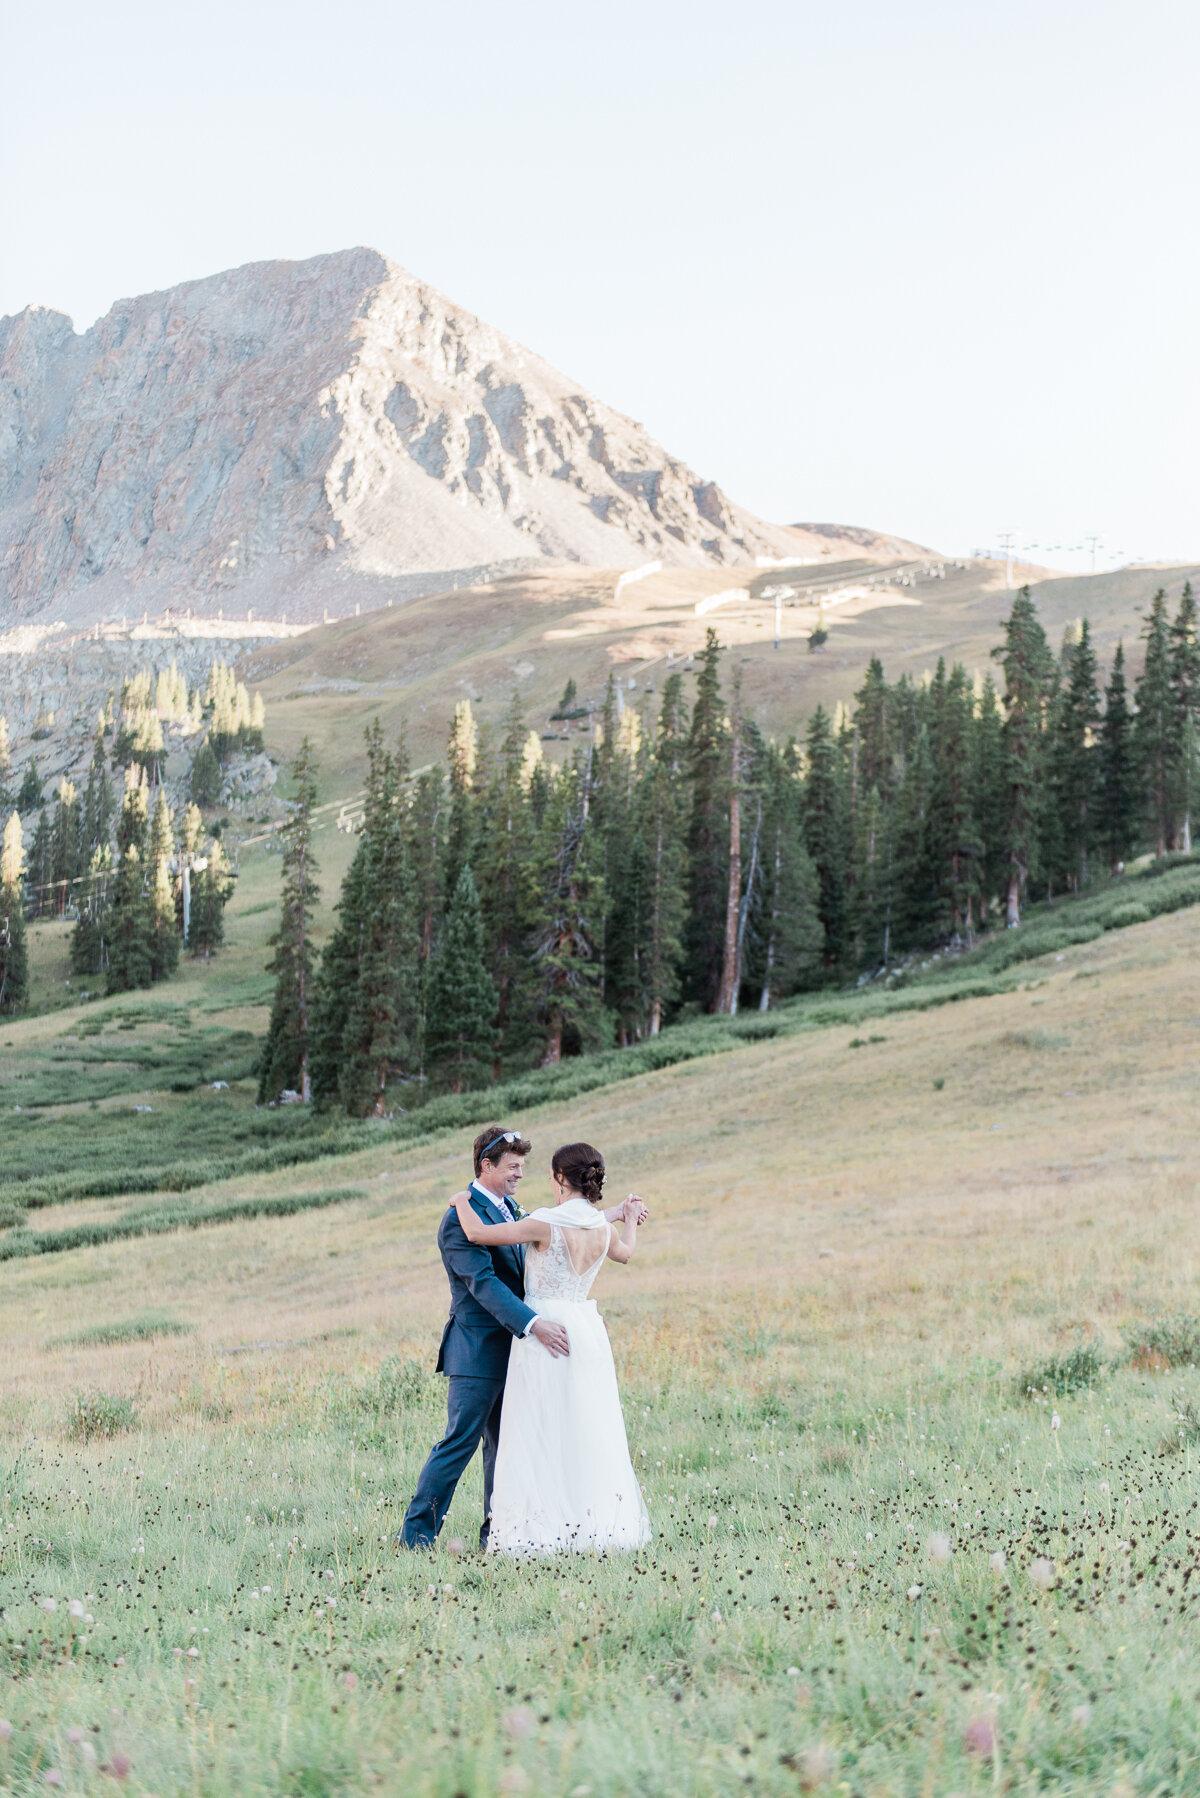 AshleighMillerPhotography-Wedding-Natalia-Matt-ArapahoeBasin-Colorado-35.jpg